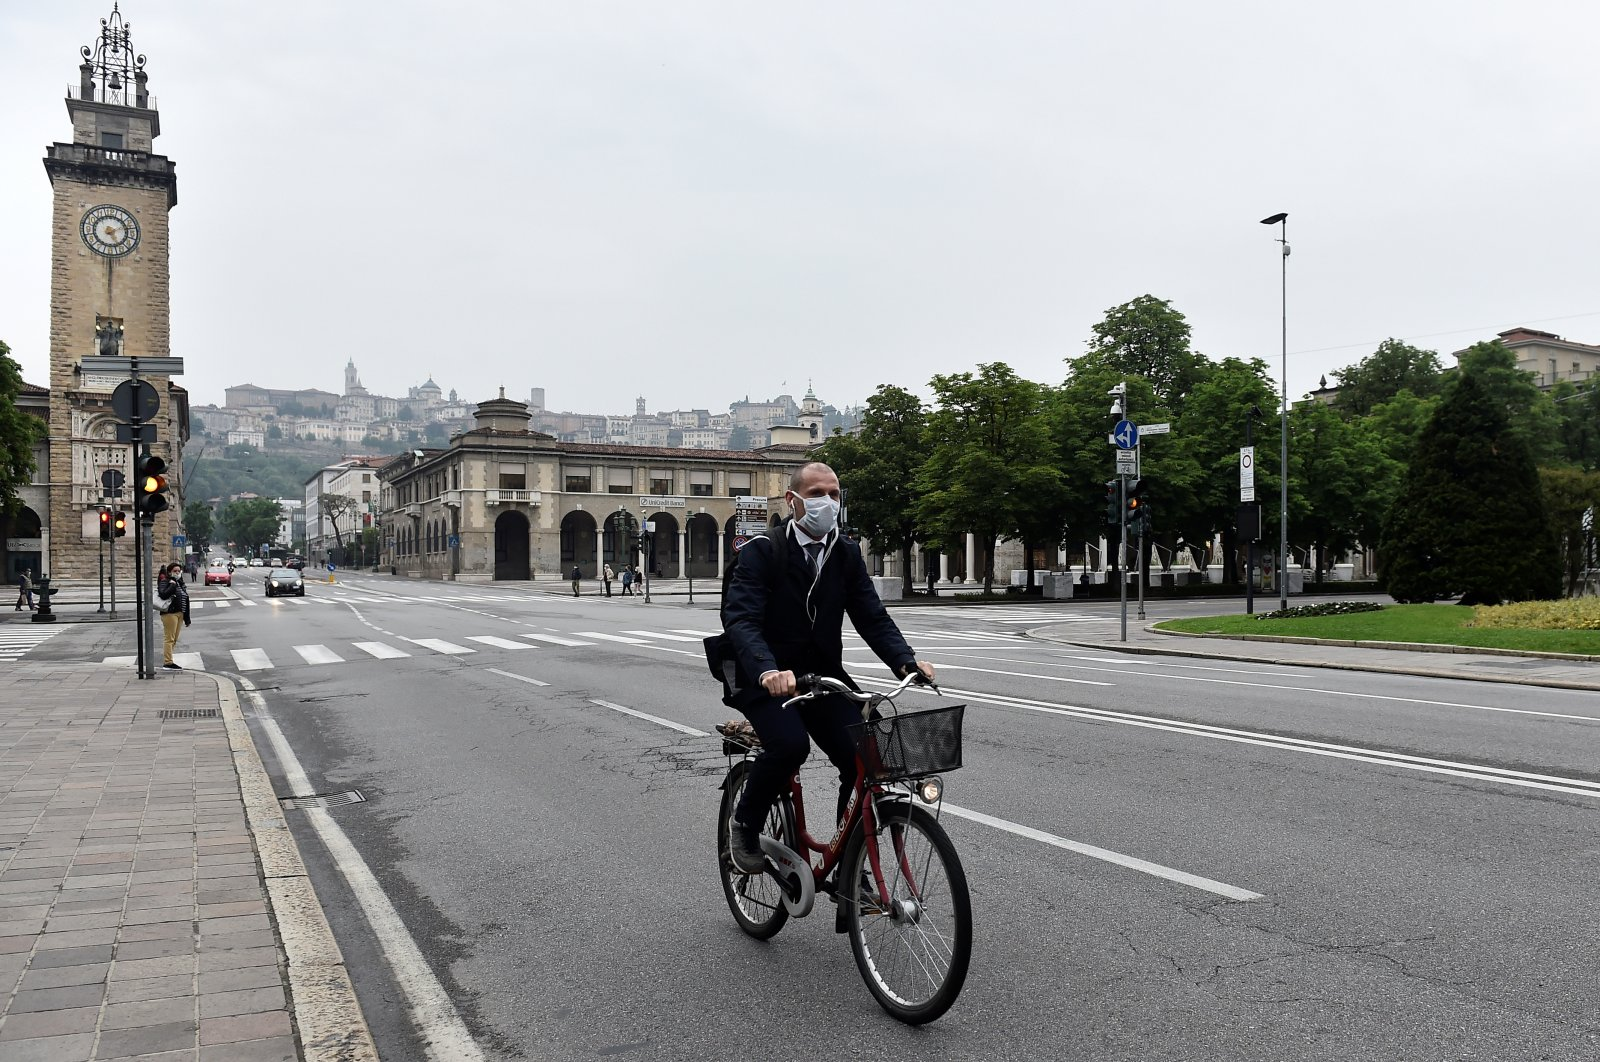 A man wearing a face mask rides a bicycle, Bergamo, Italy, May 13, 2020. (REUTERS Photo)